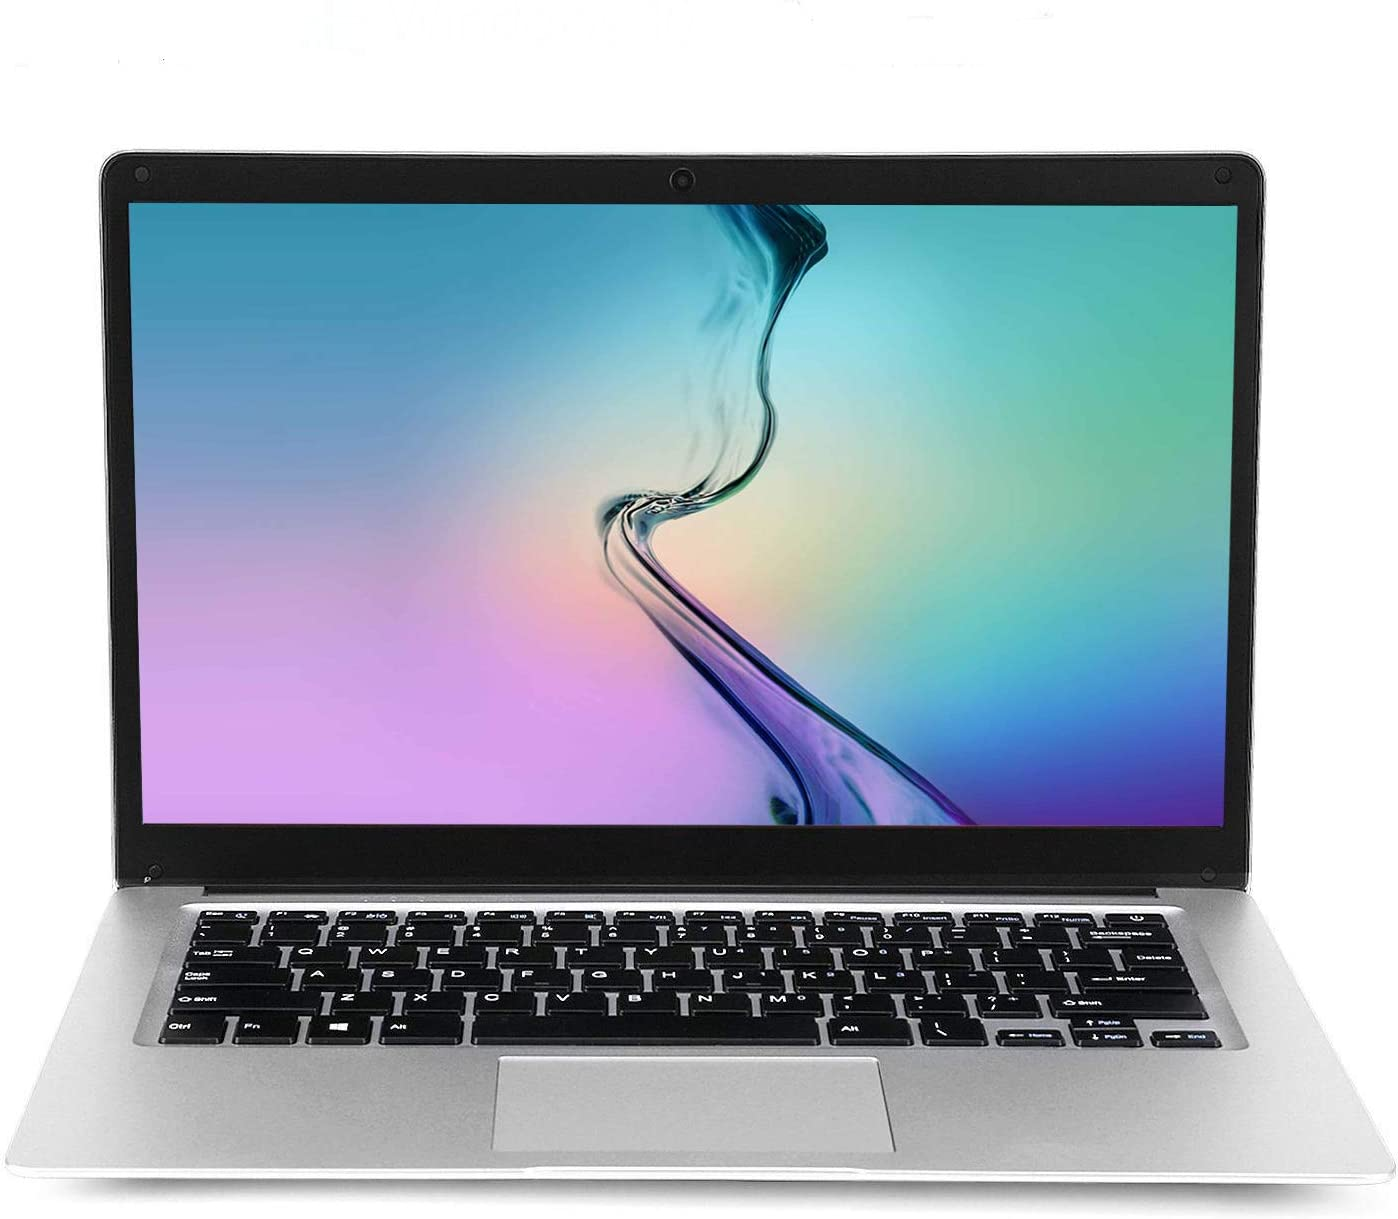 15.6 inch Laptop Computer PC Notebook, 8GB RAM 128GB Storage, Intel CPU Quad-Core Celeron J3455 1.5GHz, 10000mAh Large Capacity Battery Endurance